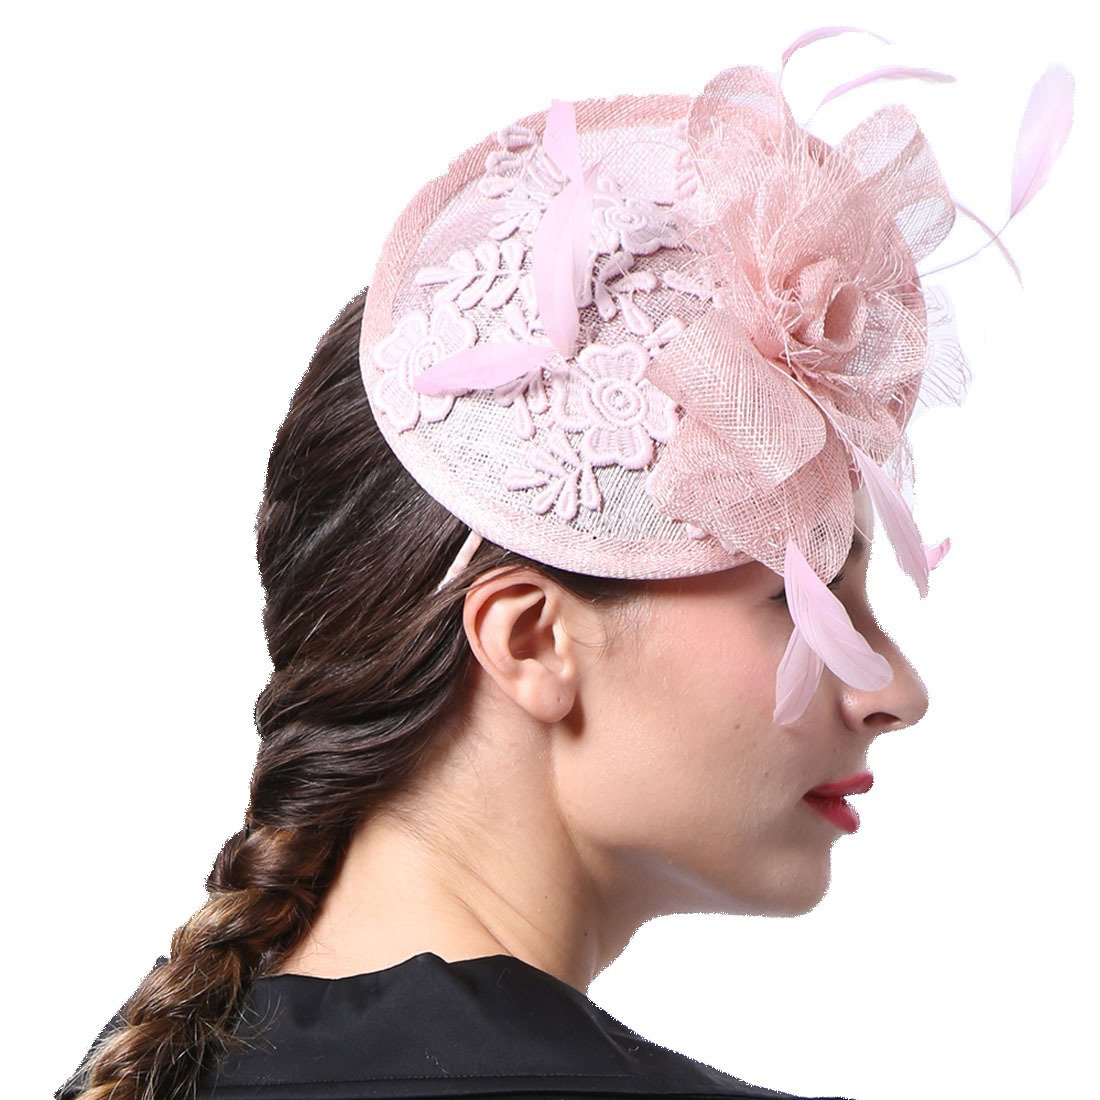 June  s Young Mujer - Tocado pelo joyas con plumas novia sombrero de joyas  para novia ocasión sombrero sombrero boda Rosa Talla única  Amazon.es  Ropa  y ... dcc9589e463